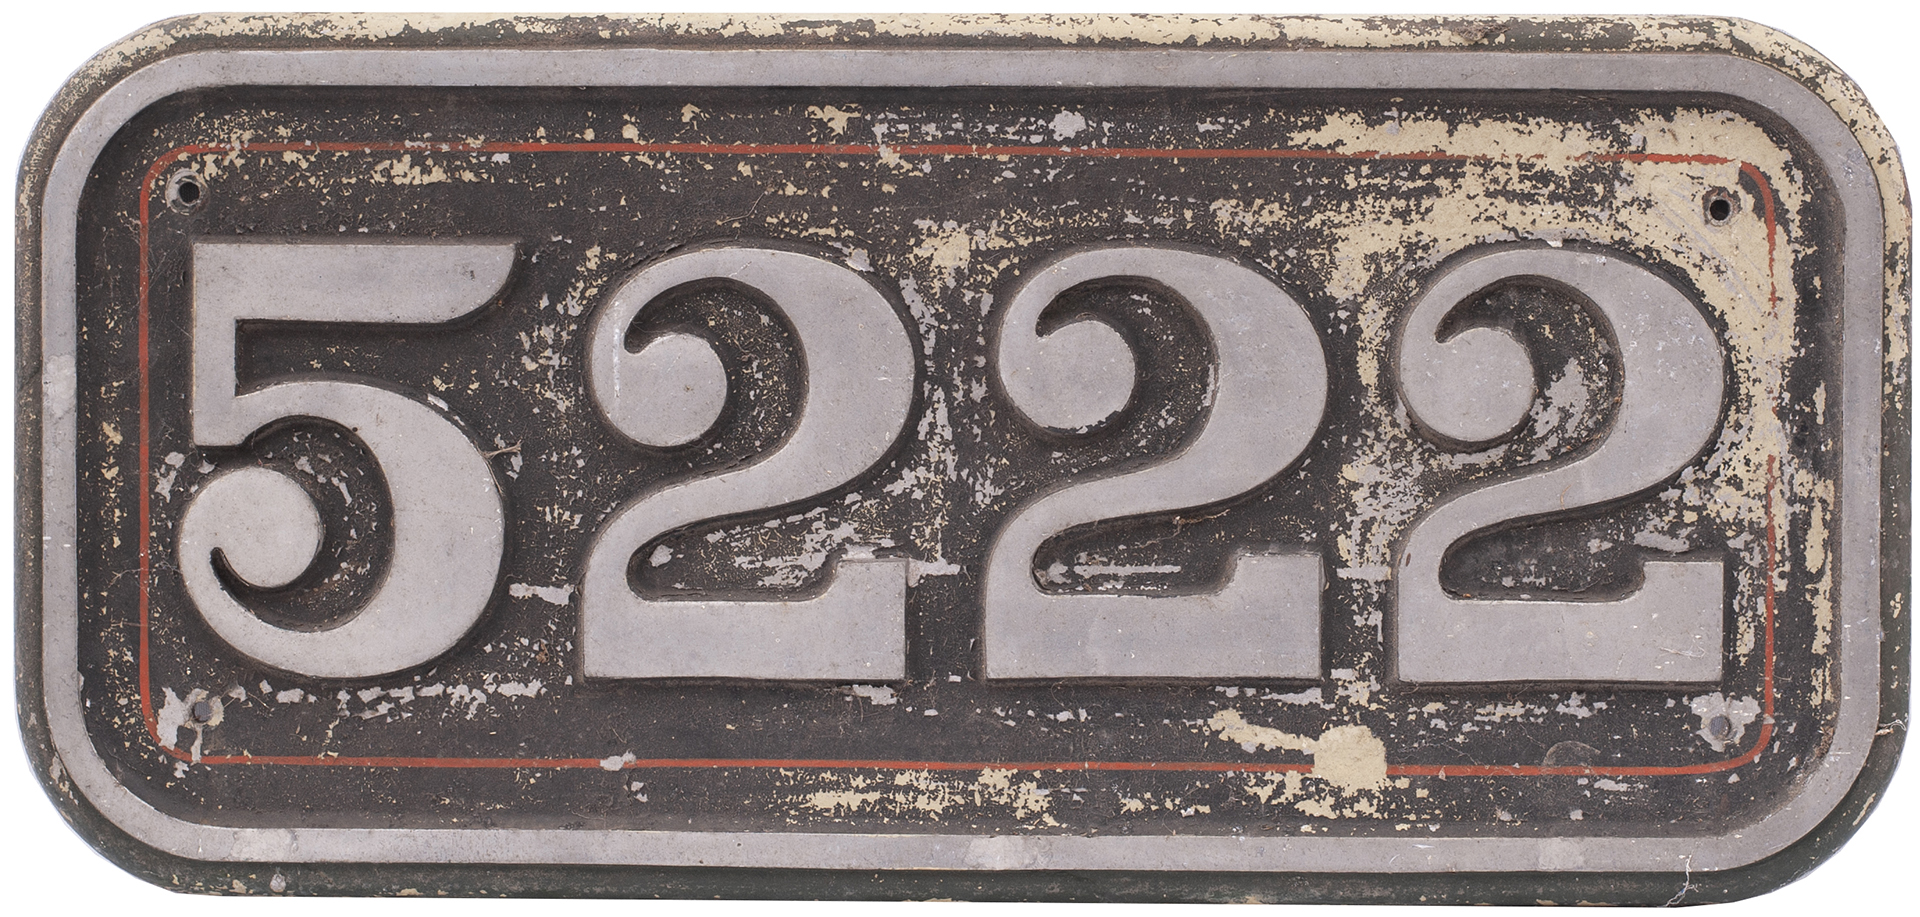 Cabside numberplate 5222 ex British Railways diesel class 25 D5222 / 25072. Built at Derby in 1963